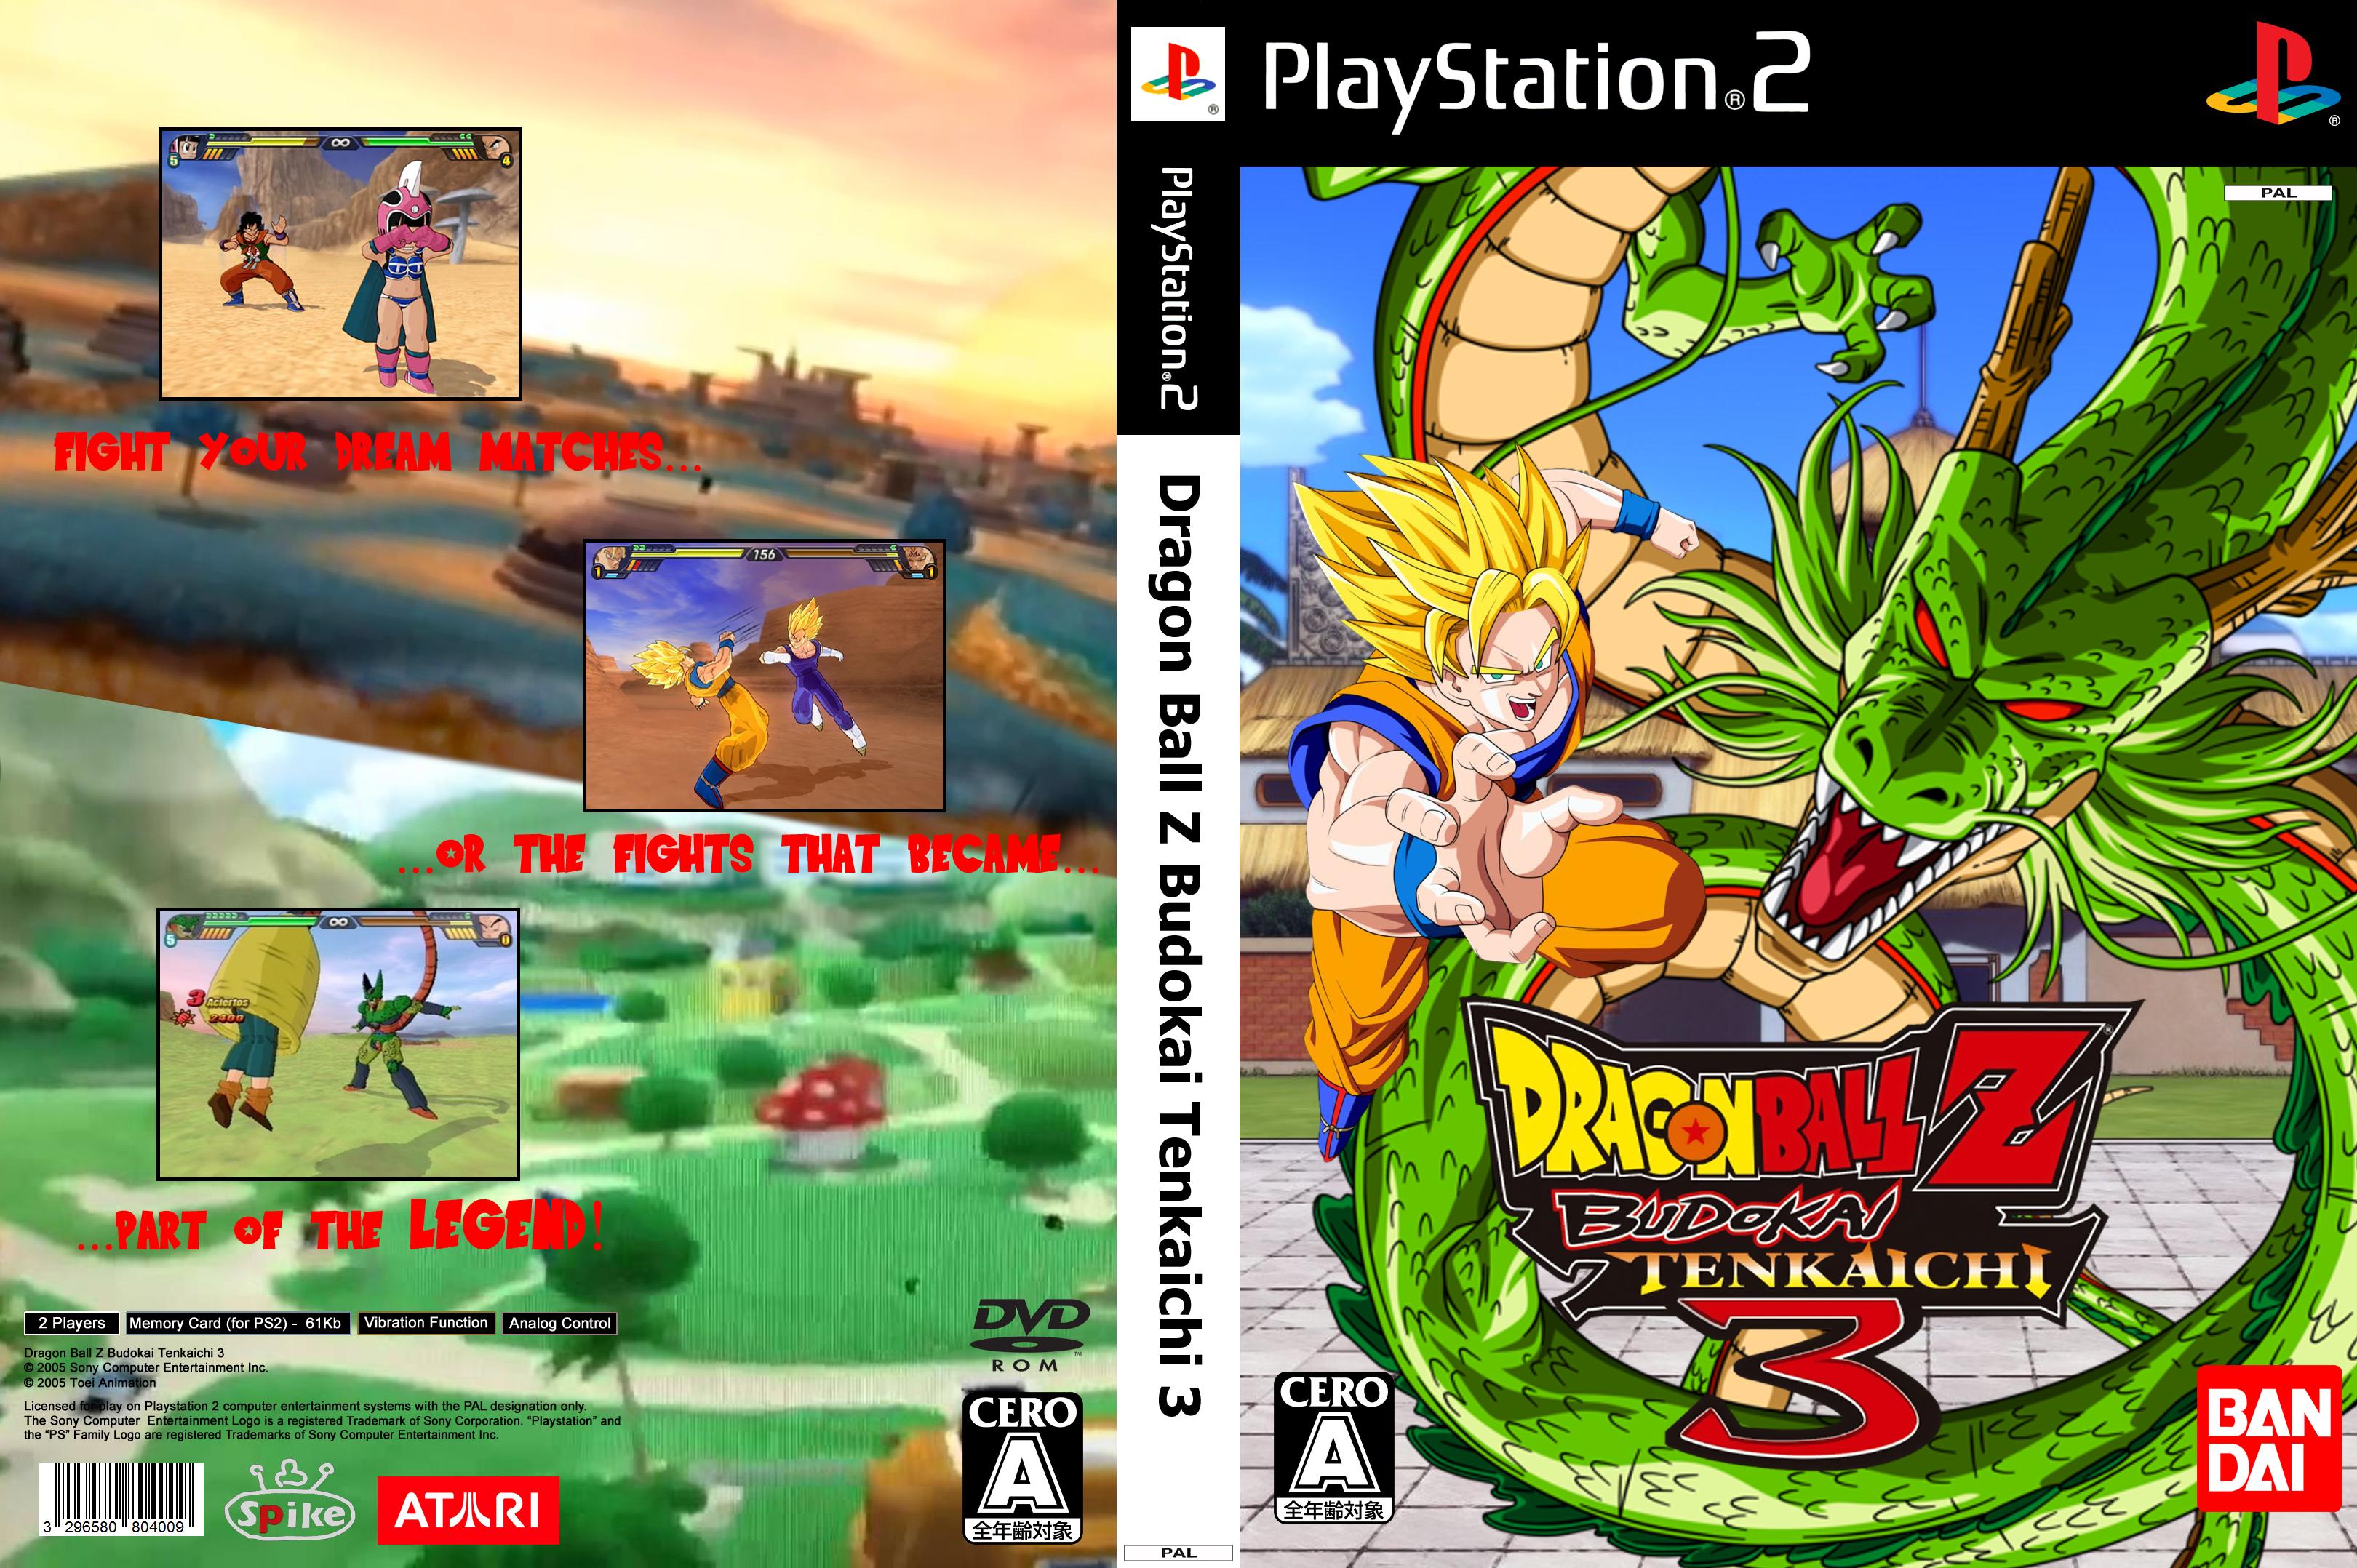 download dragon ball z budokai tenkaichi 3 playstation 2